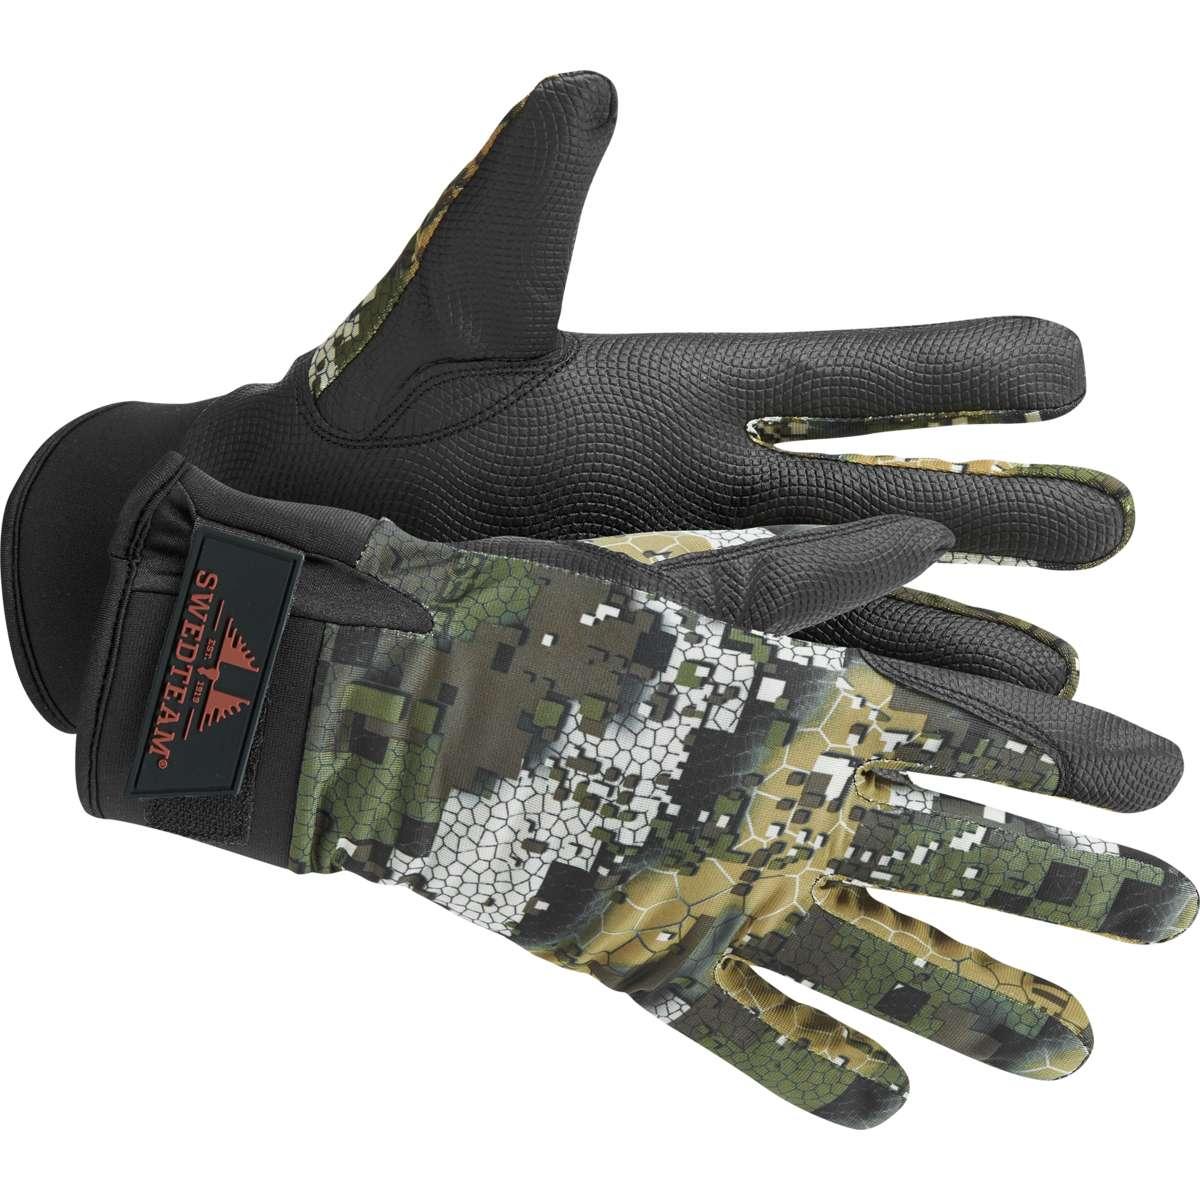 Swedteam Grip Veil M käsine, koko XL